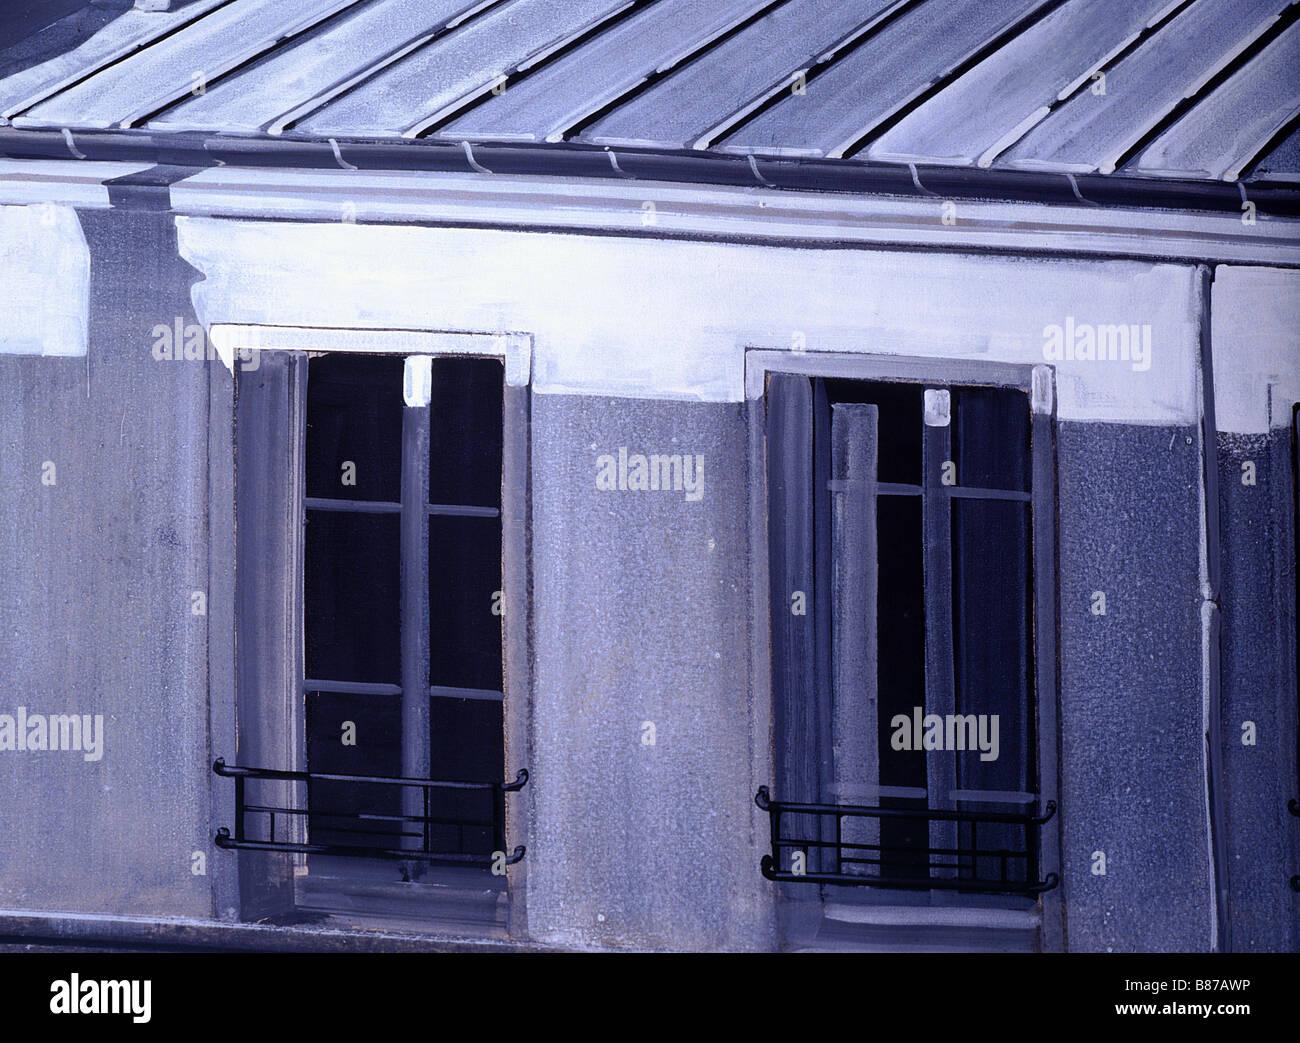 Gris Gemalt Stockfotos & Gris Gemalt Bilder - Alamy